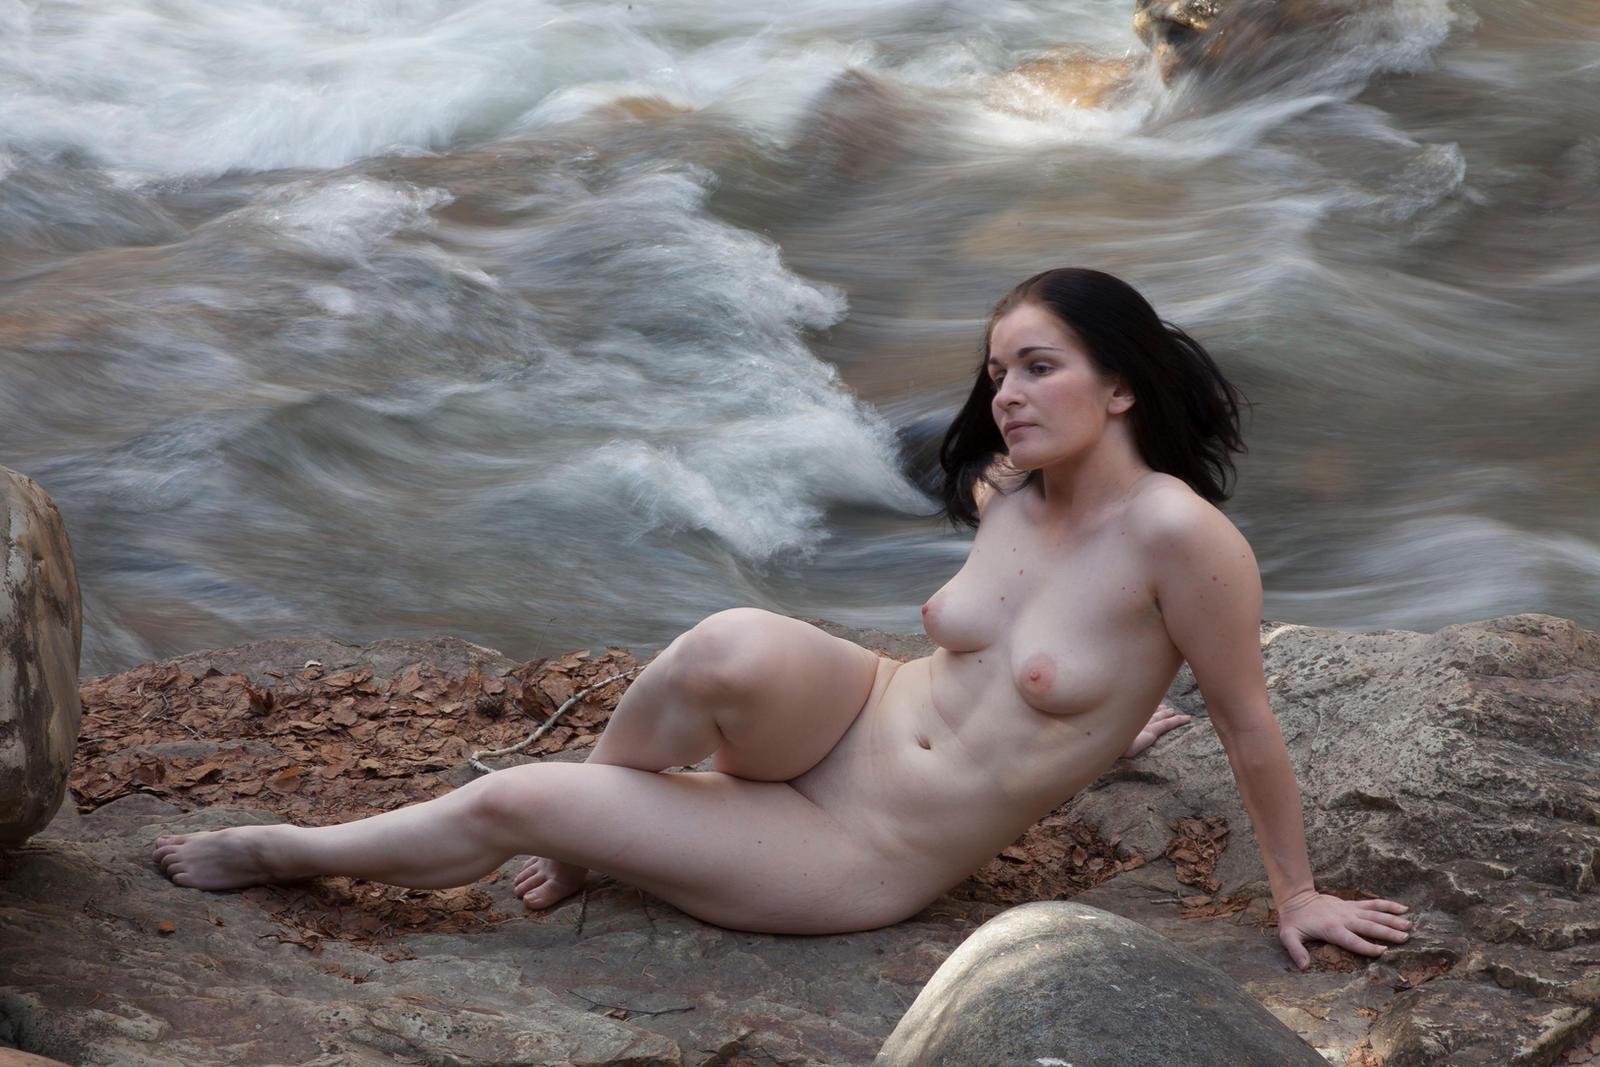 Free fine nude art photo